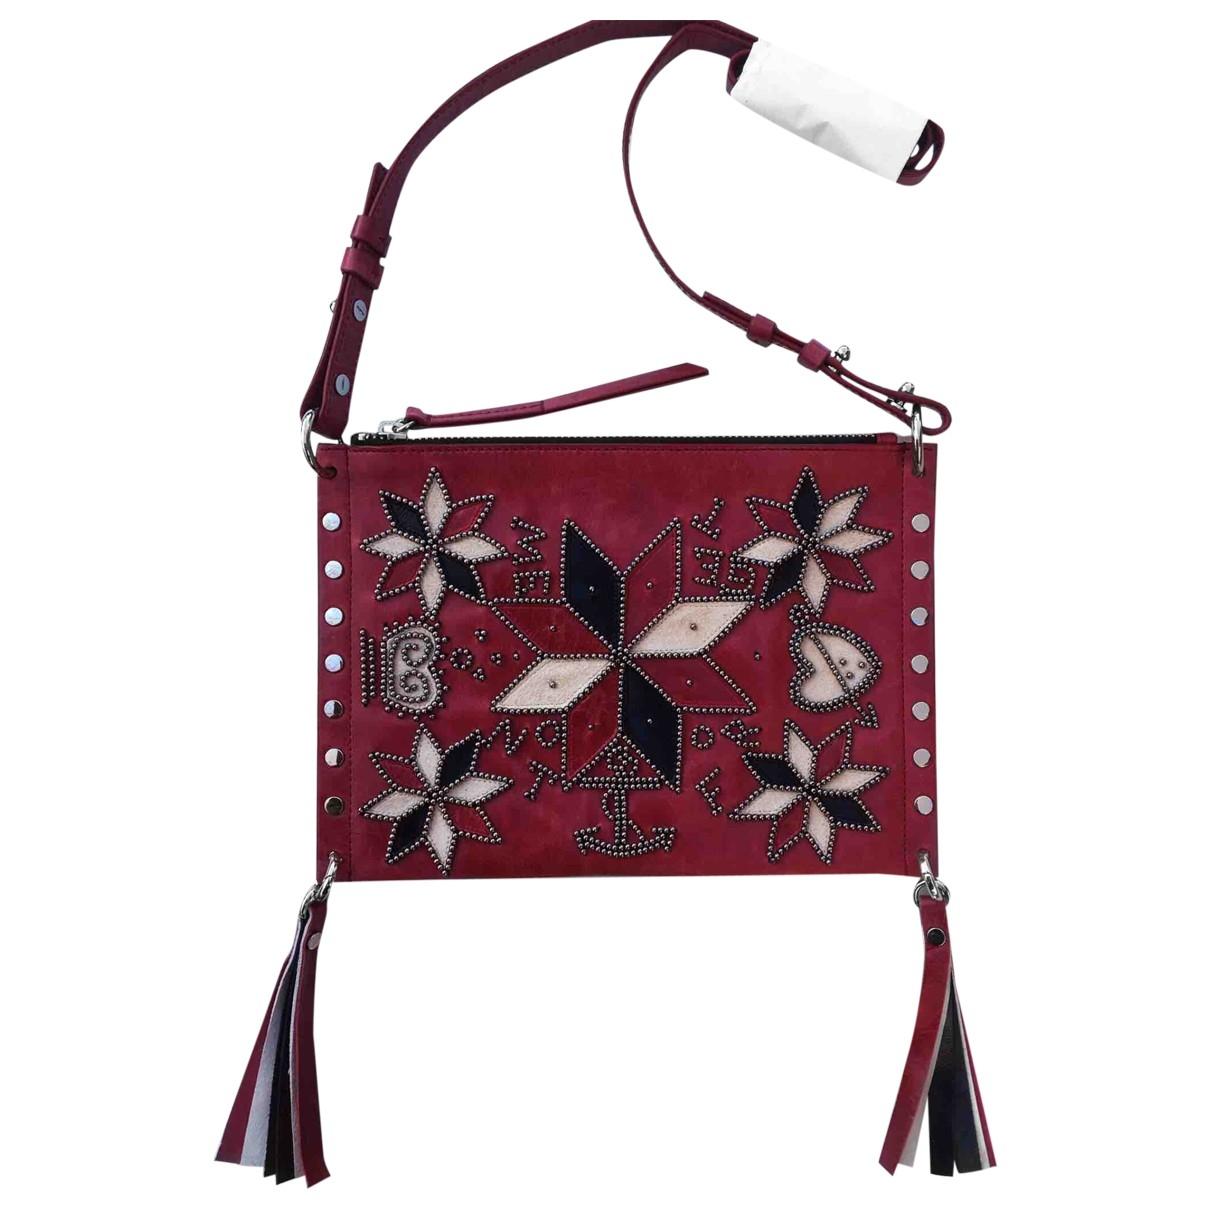 Isabel Marant \N Multicolour Leather handbag for Women \N